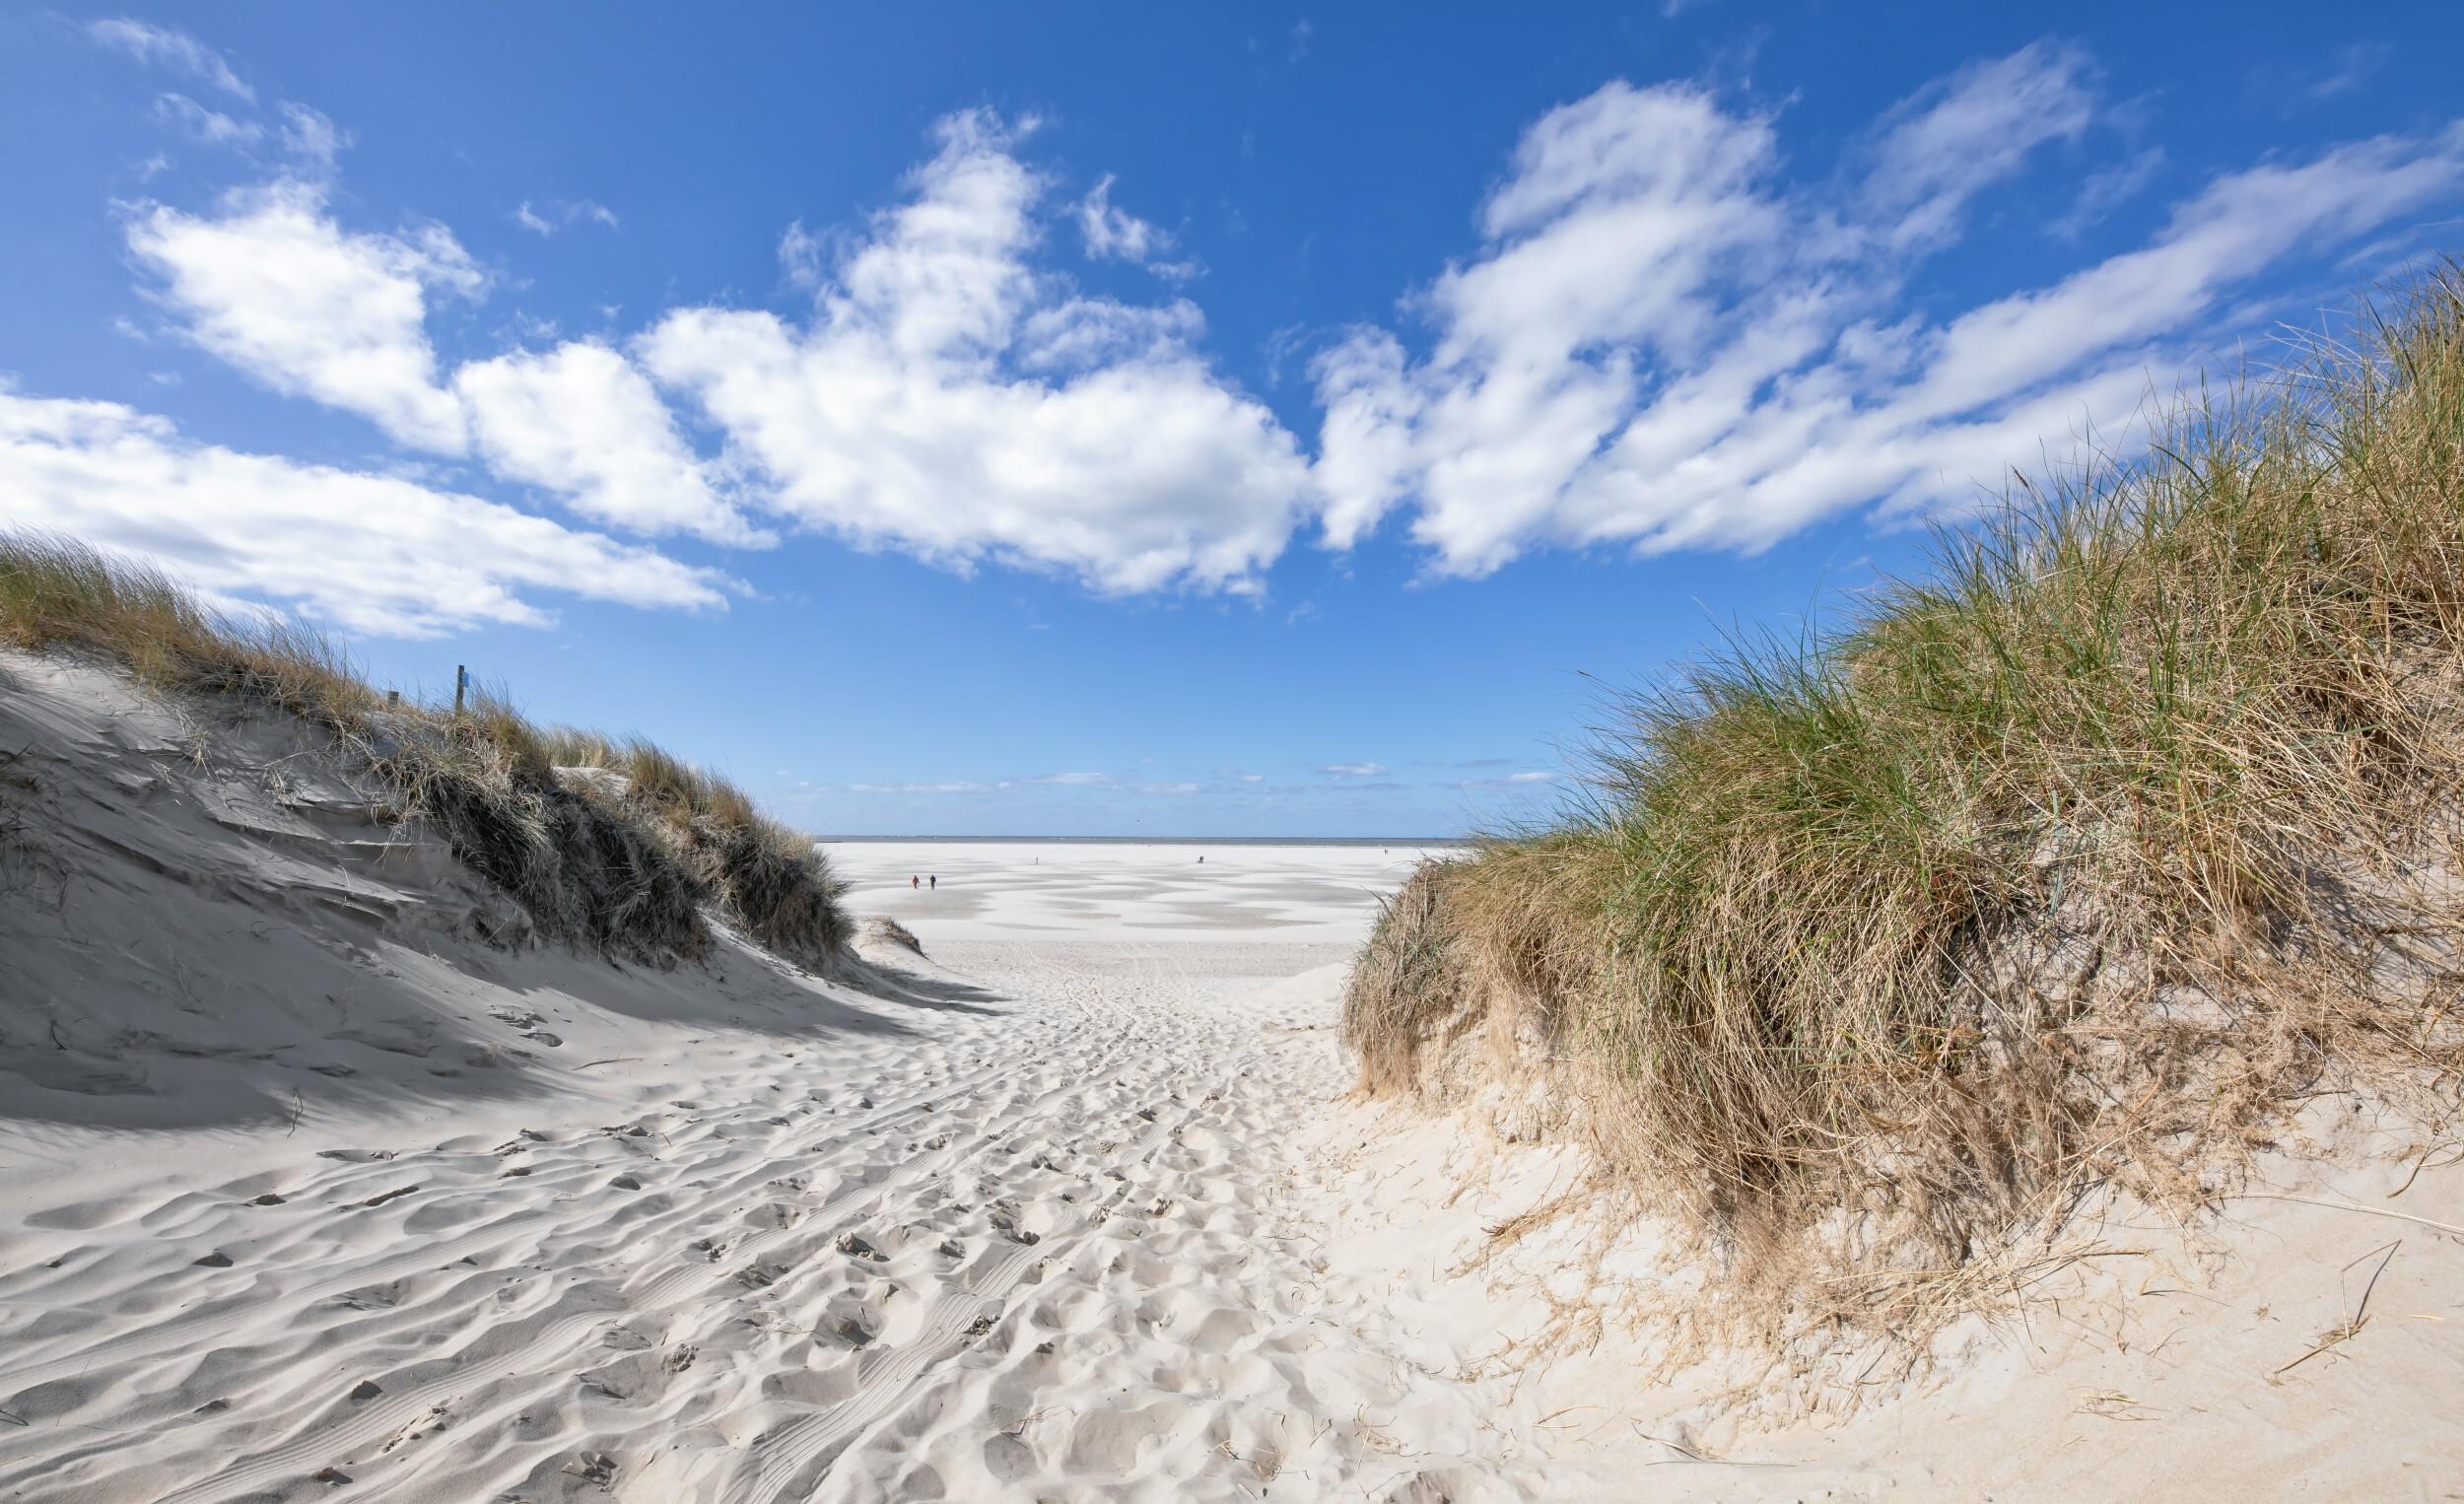 Strandopgang met blauwe lucht VVV Texel fotograaf Justin Sinner